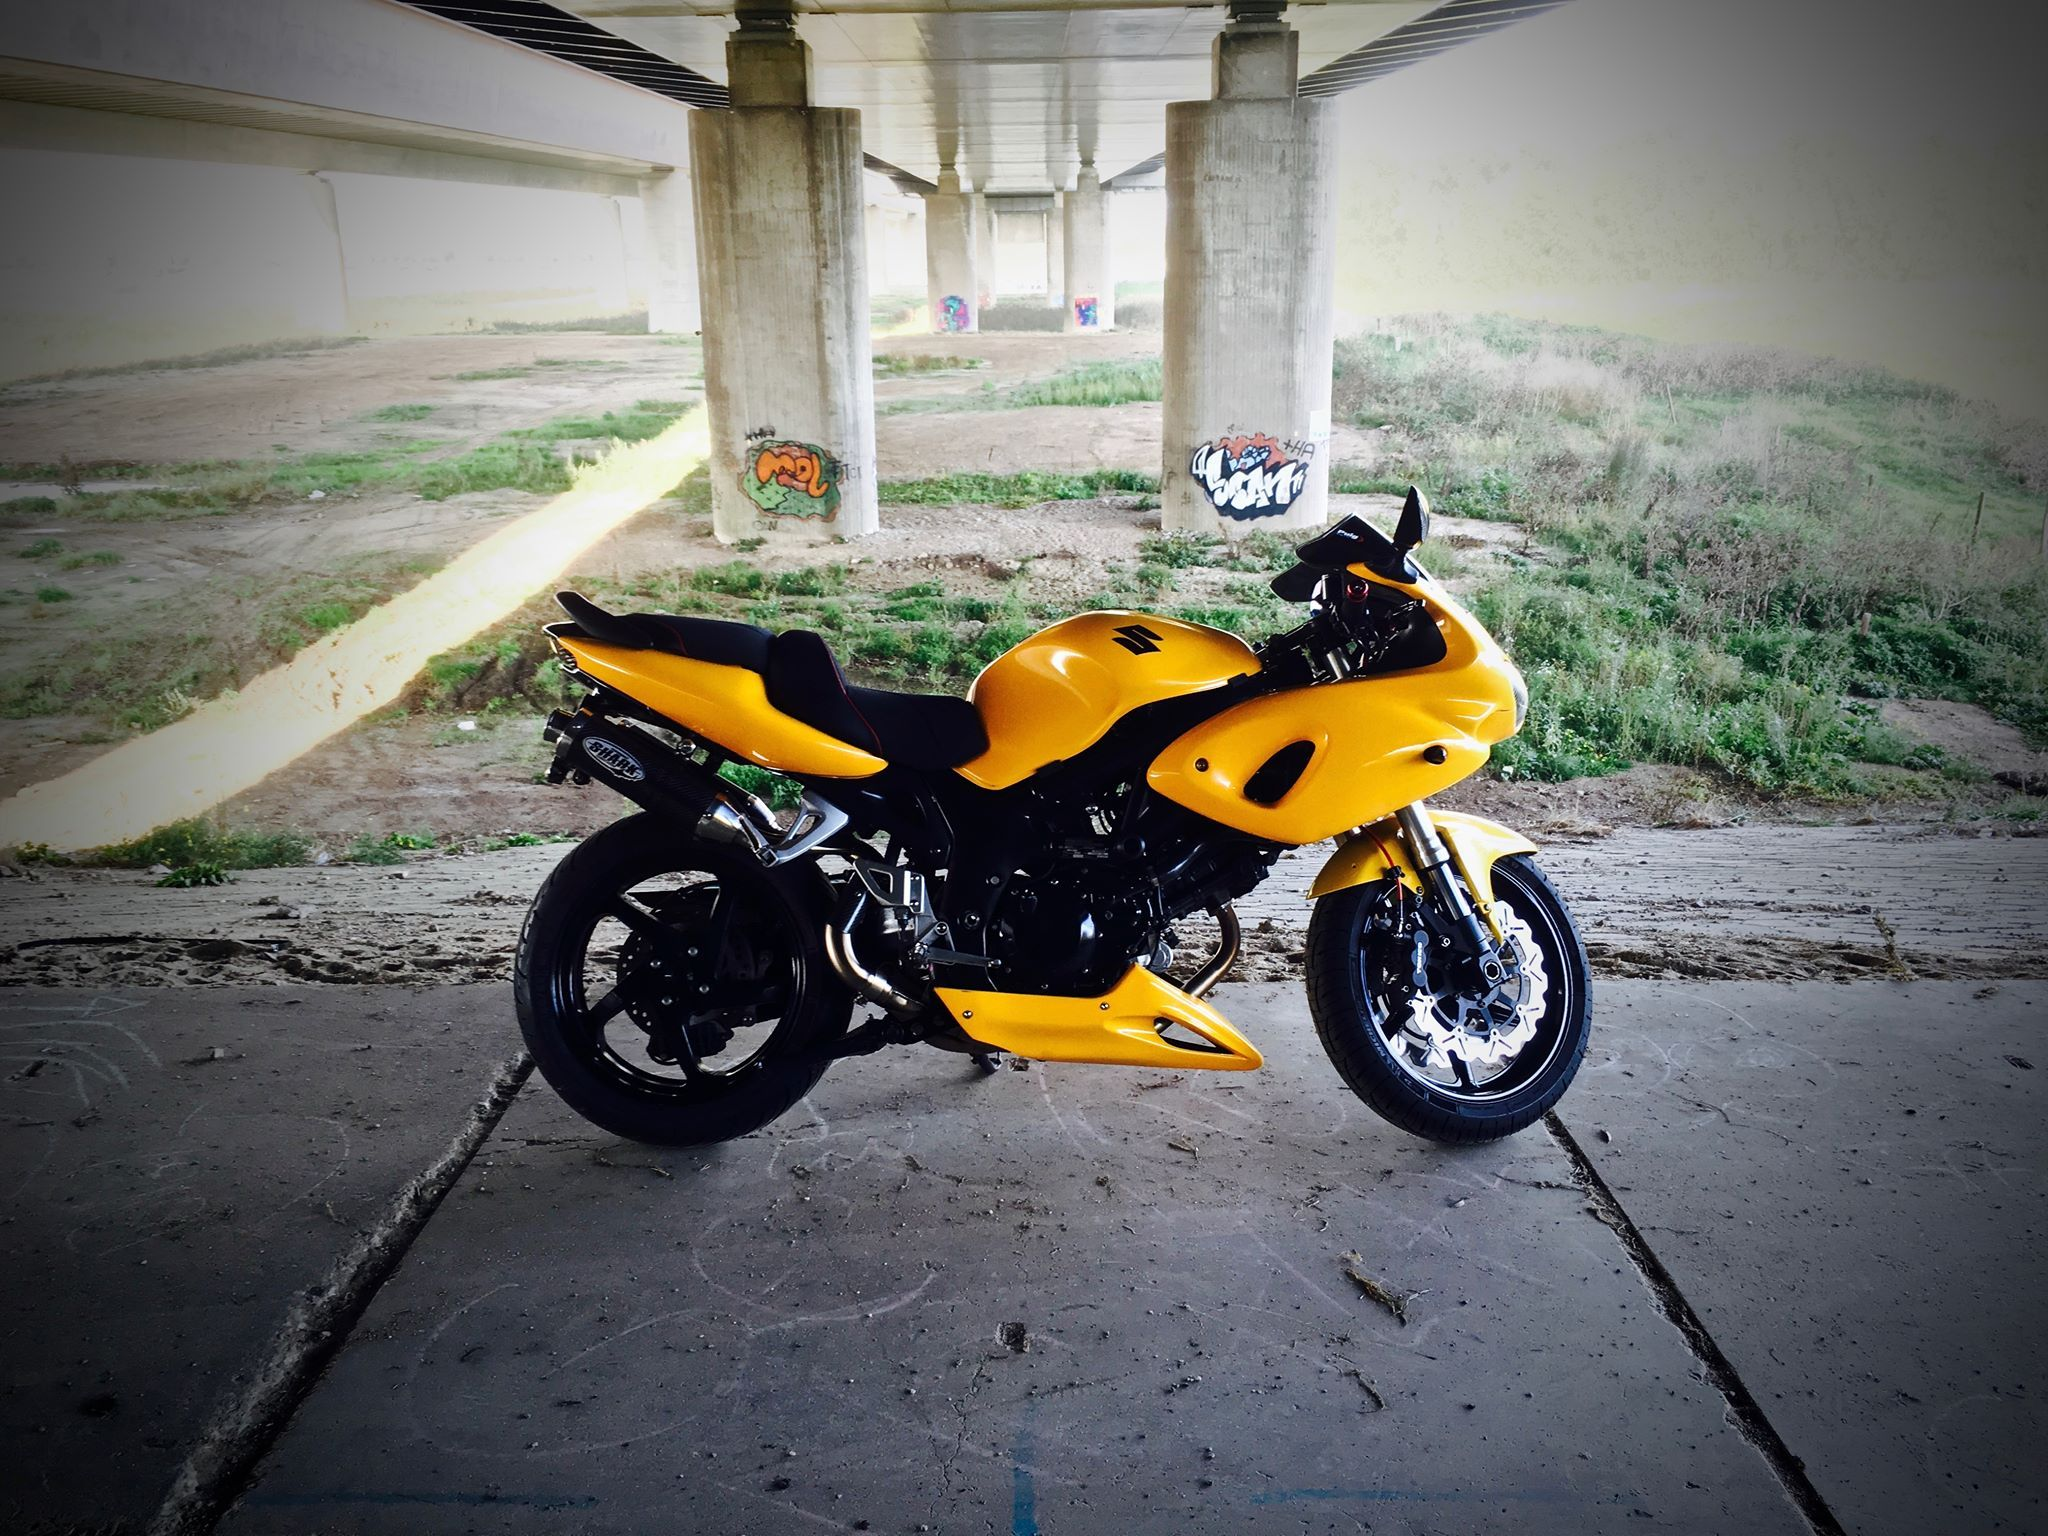 Custom suzuki sv650s 99 02 honda vfr vtec swingarm suzuki tl1000r fron suspension honda vtr